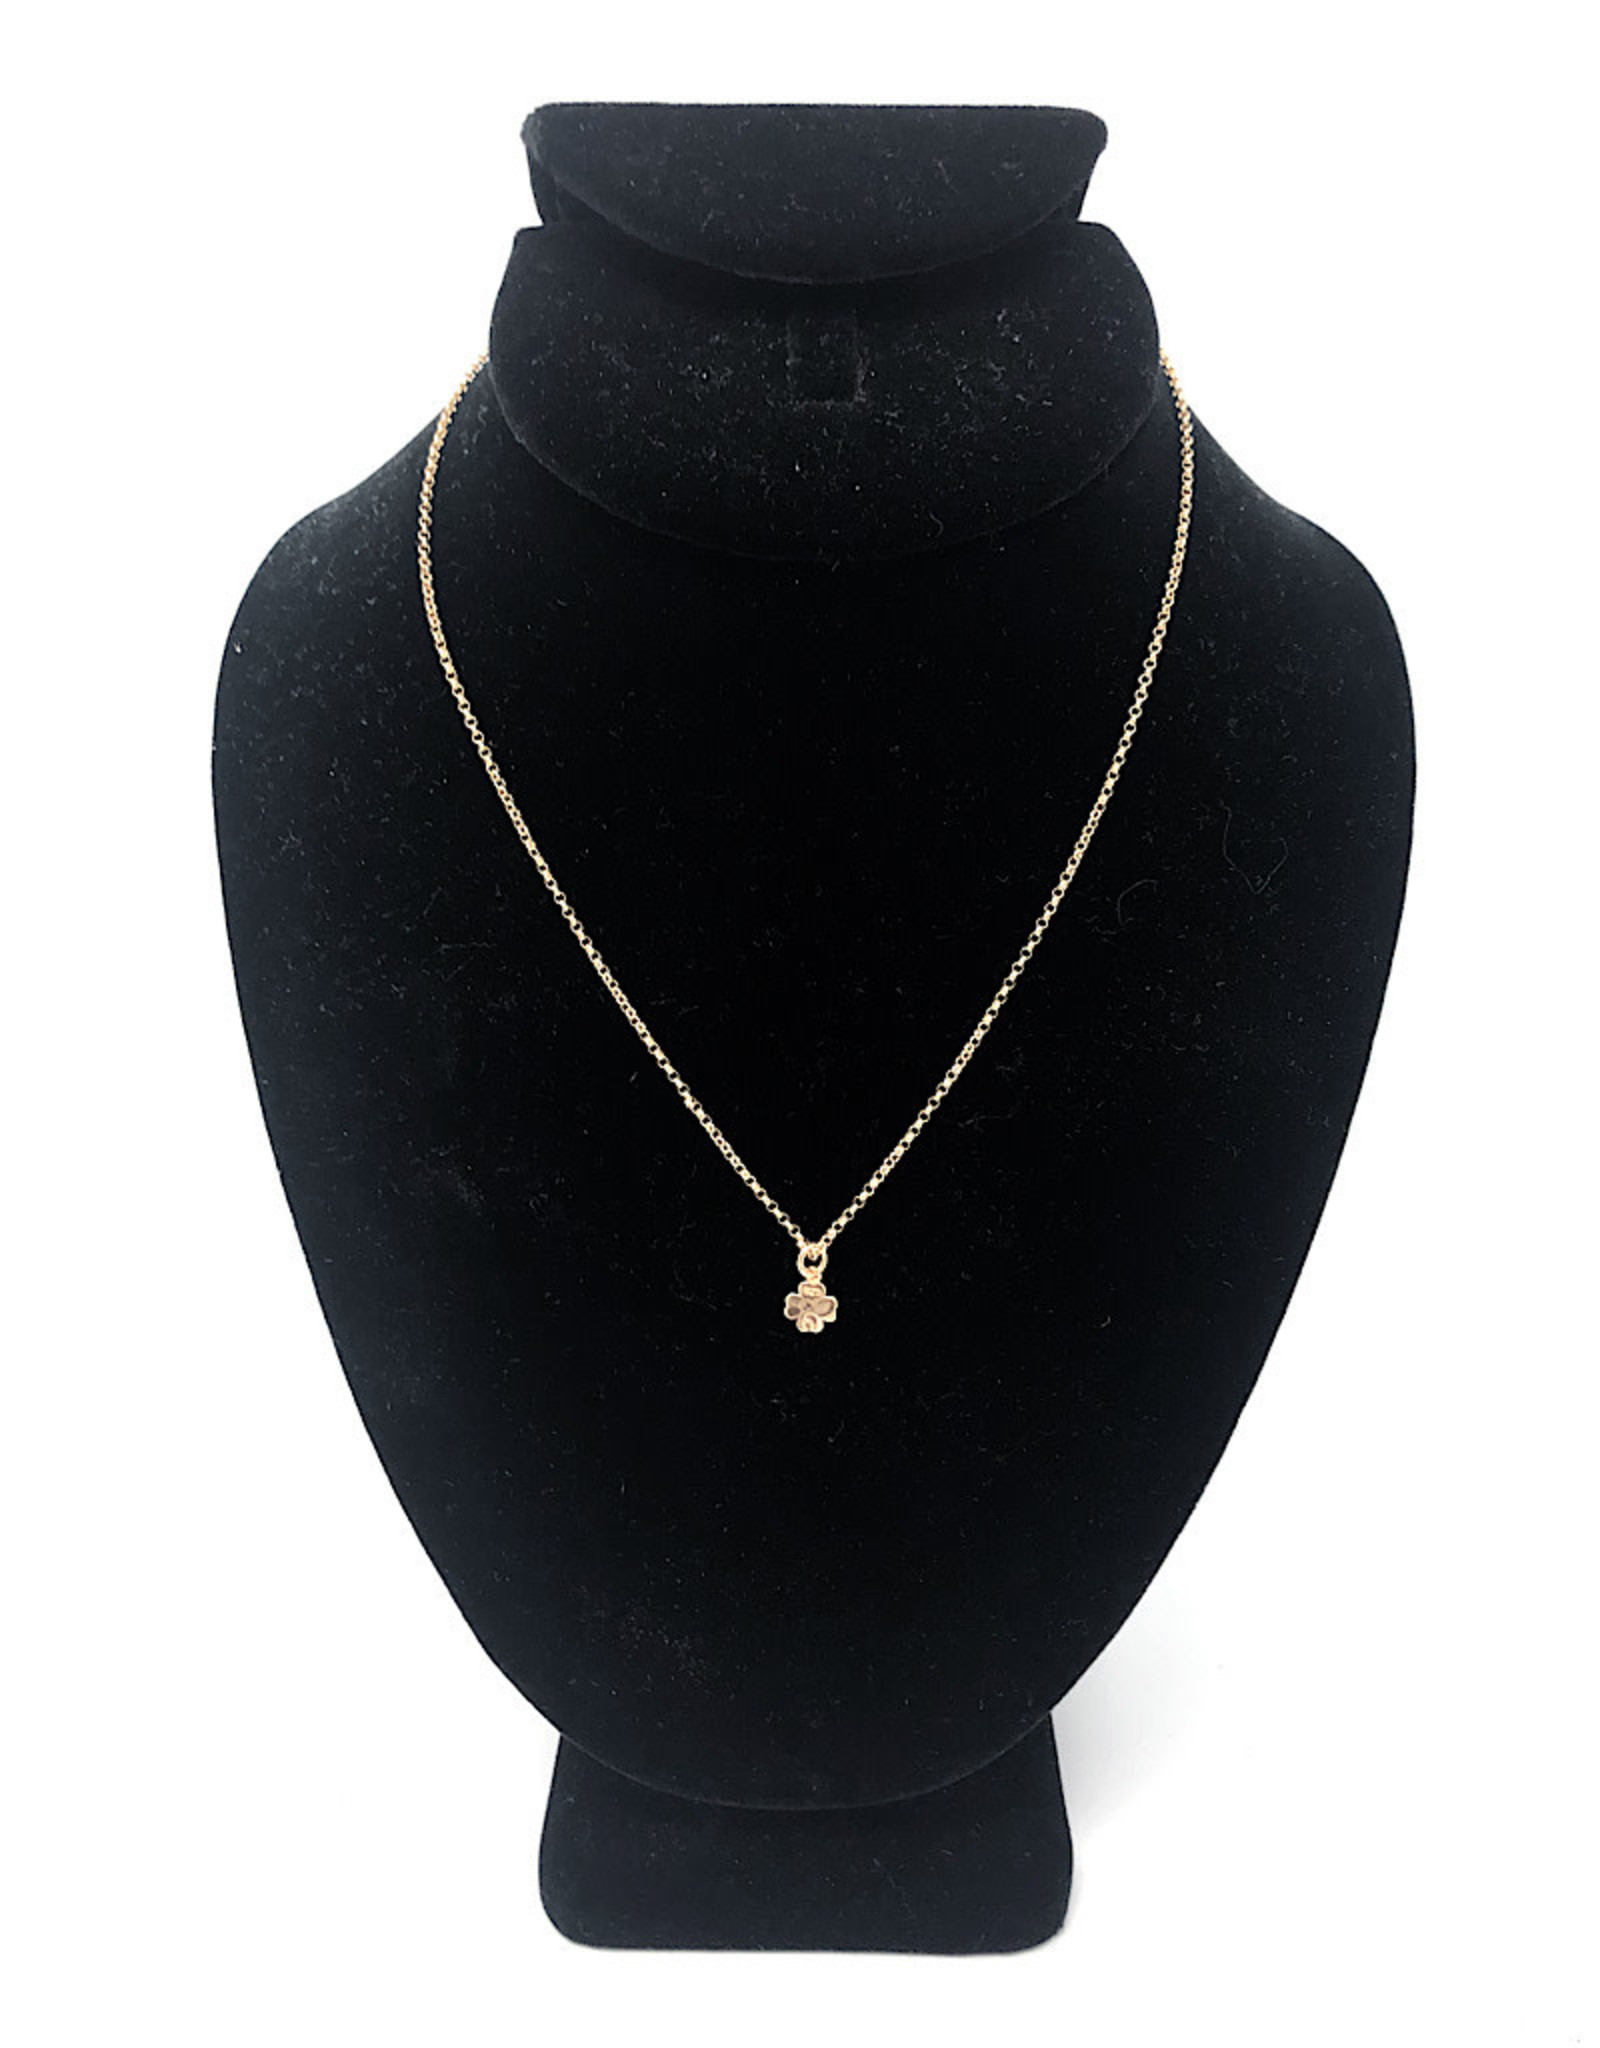 Beblue Gold Necklace Clover